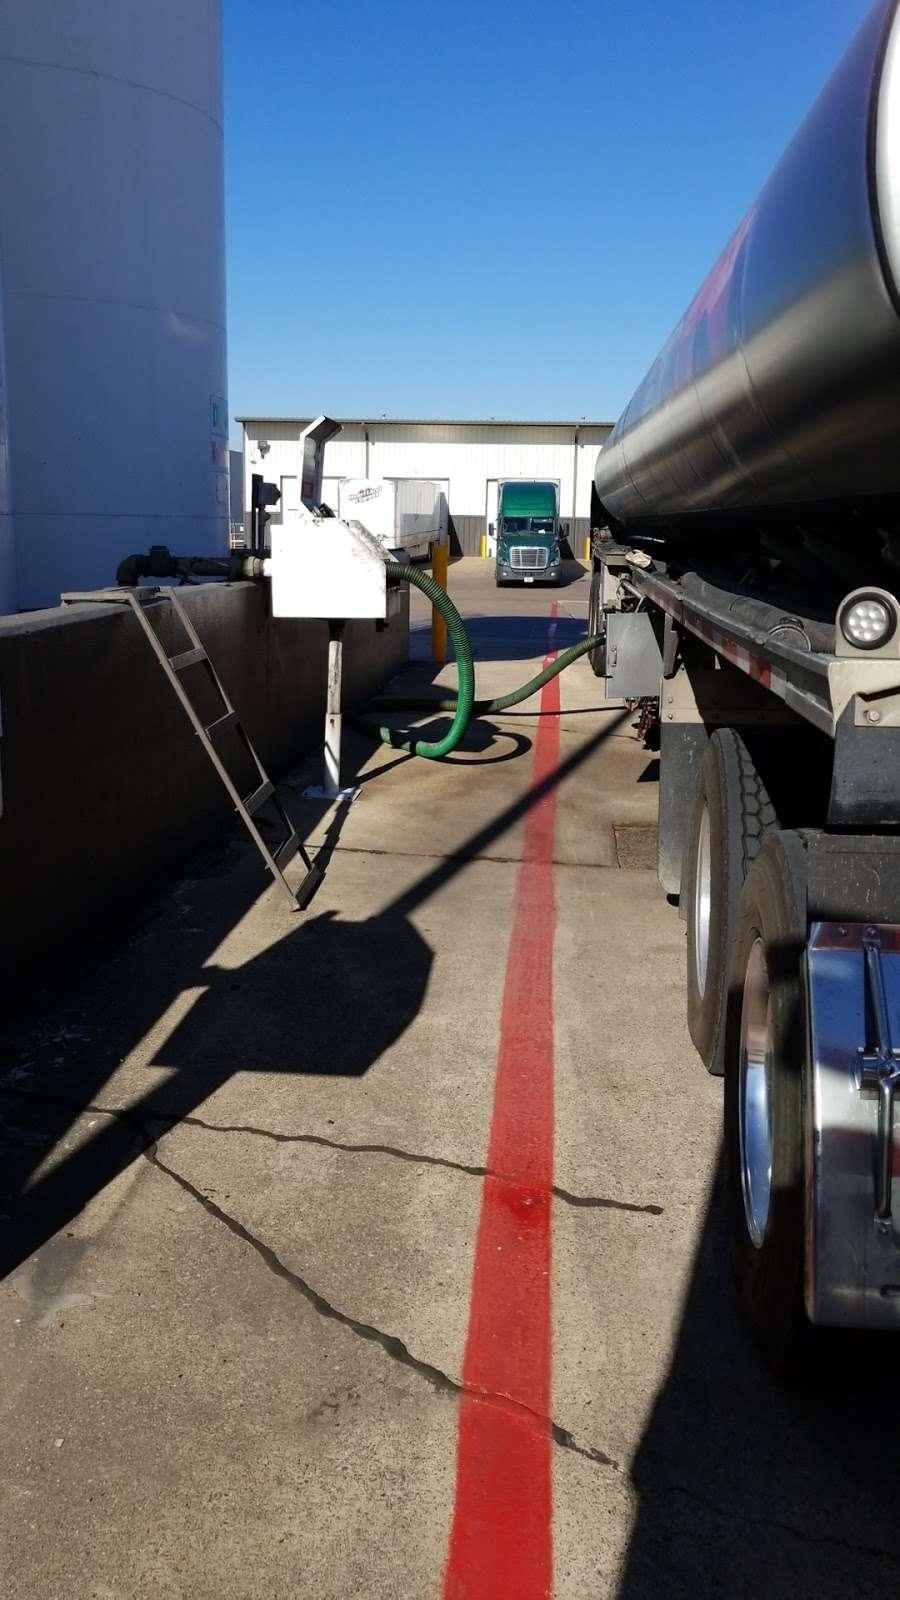 Heartland Express Inc - moving company  | Photo 9 of 10 | Address: 215 Environmental Way, Seagoville, TX 75159, USA | Phone: (866) 284-5605